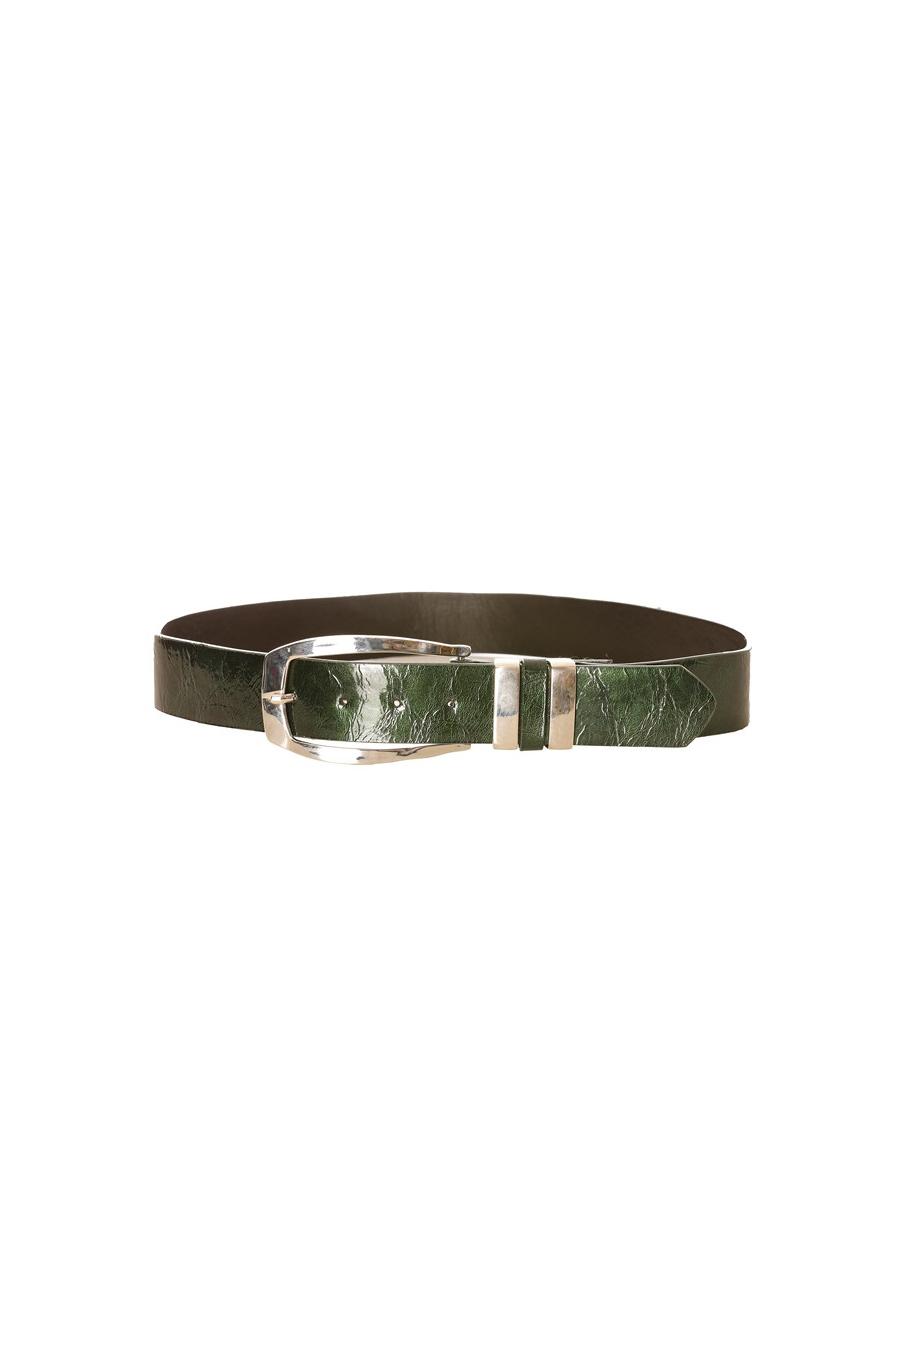 glanzende groene riem. M17-009